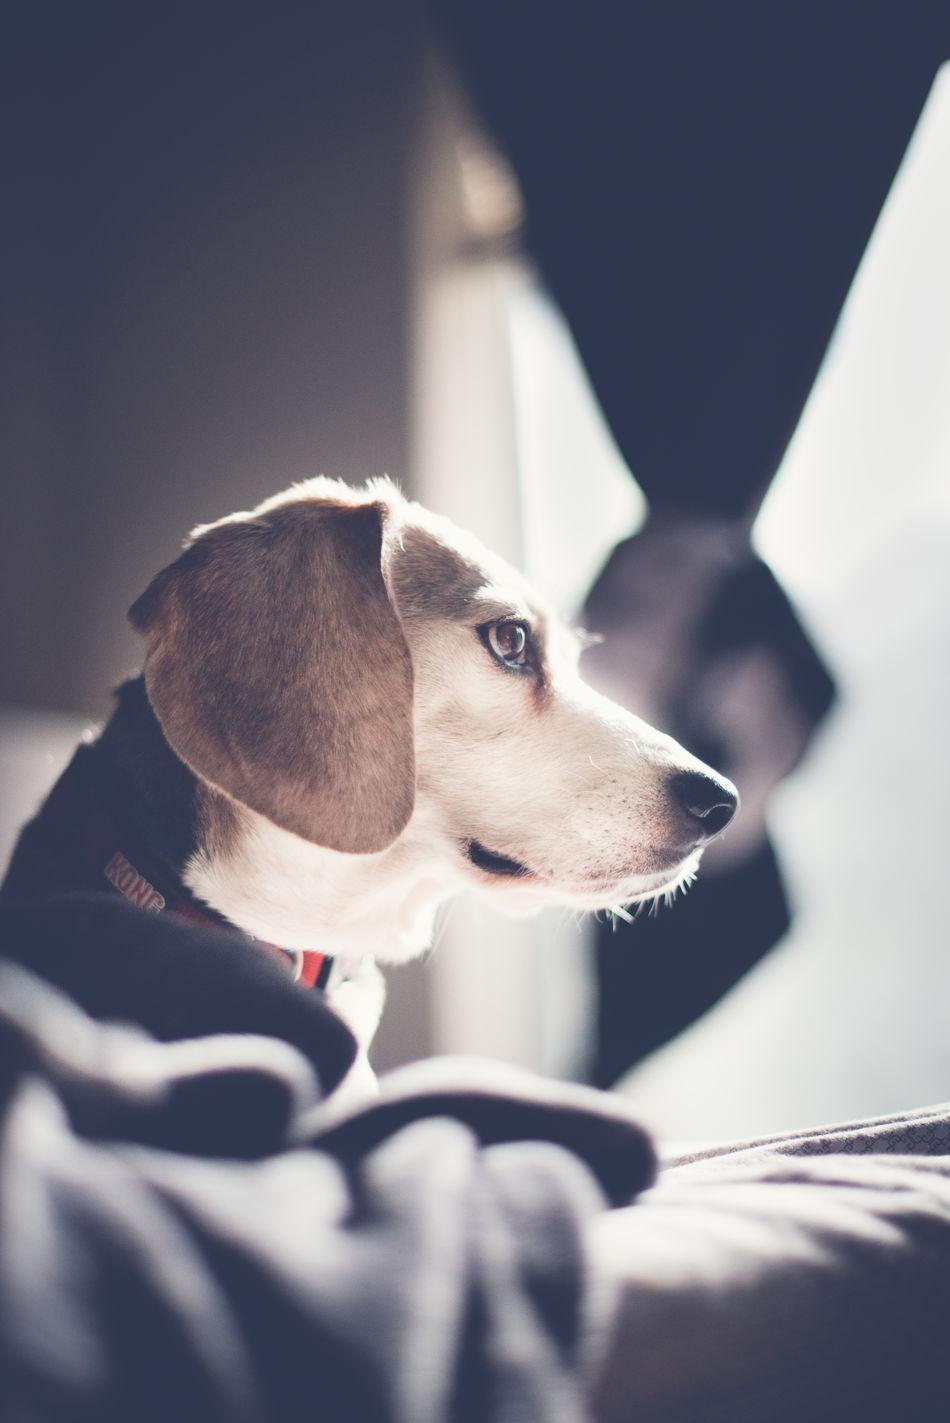 Animal Themes Beagle Beagle Love Close-up Day Dog Dog Photography Dog Portrait Dog Portraiture Domestic Animals Indoors  Mammal My Love No People One Animal Pet Photography  Pet Portraits Pet Portraiture Pets